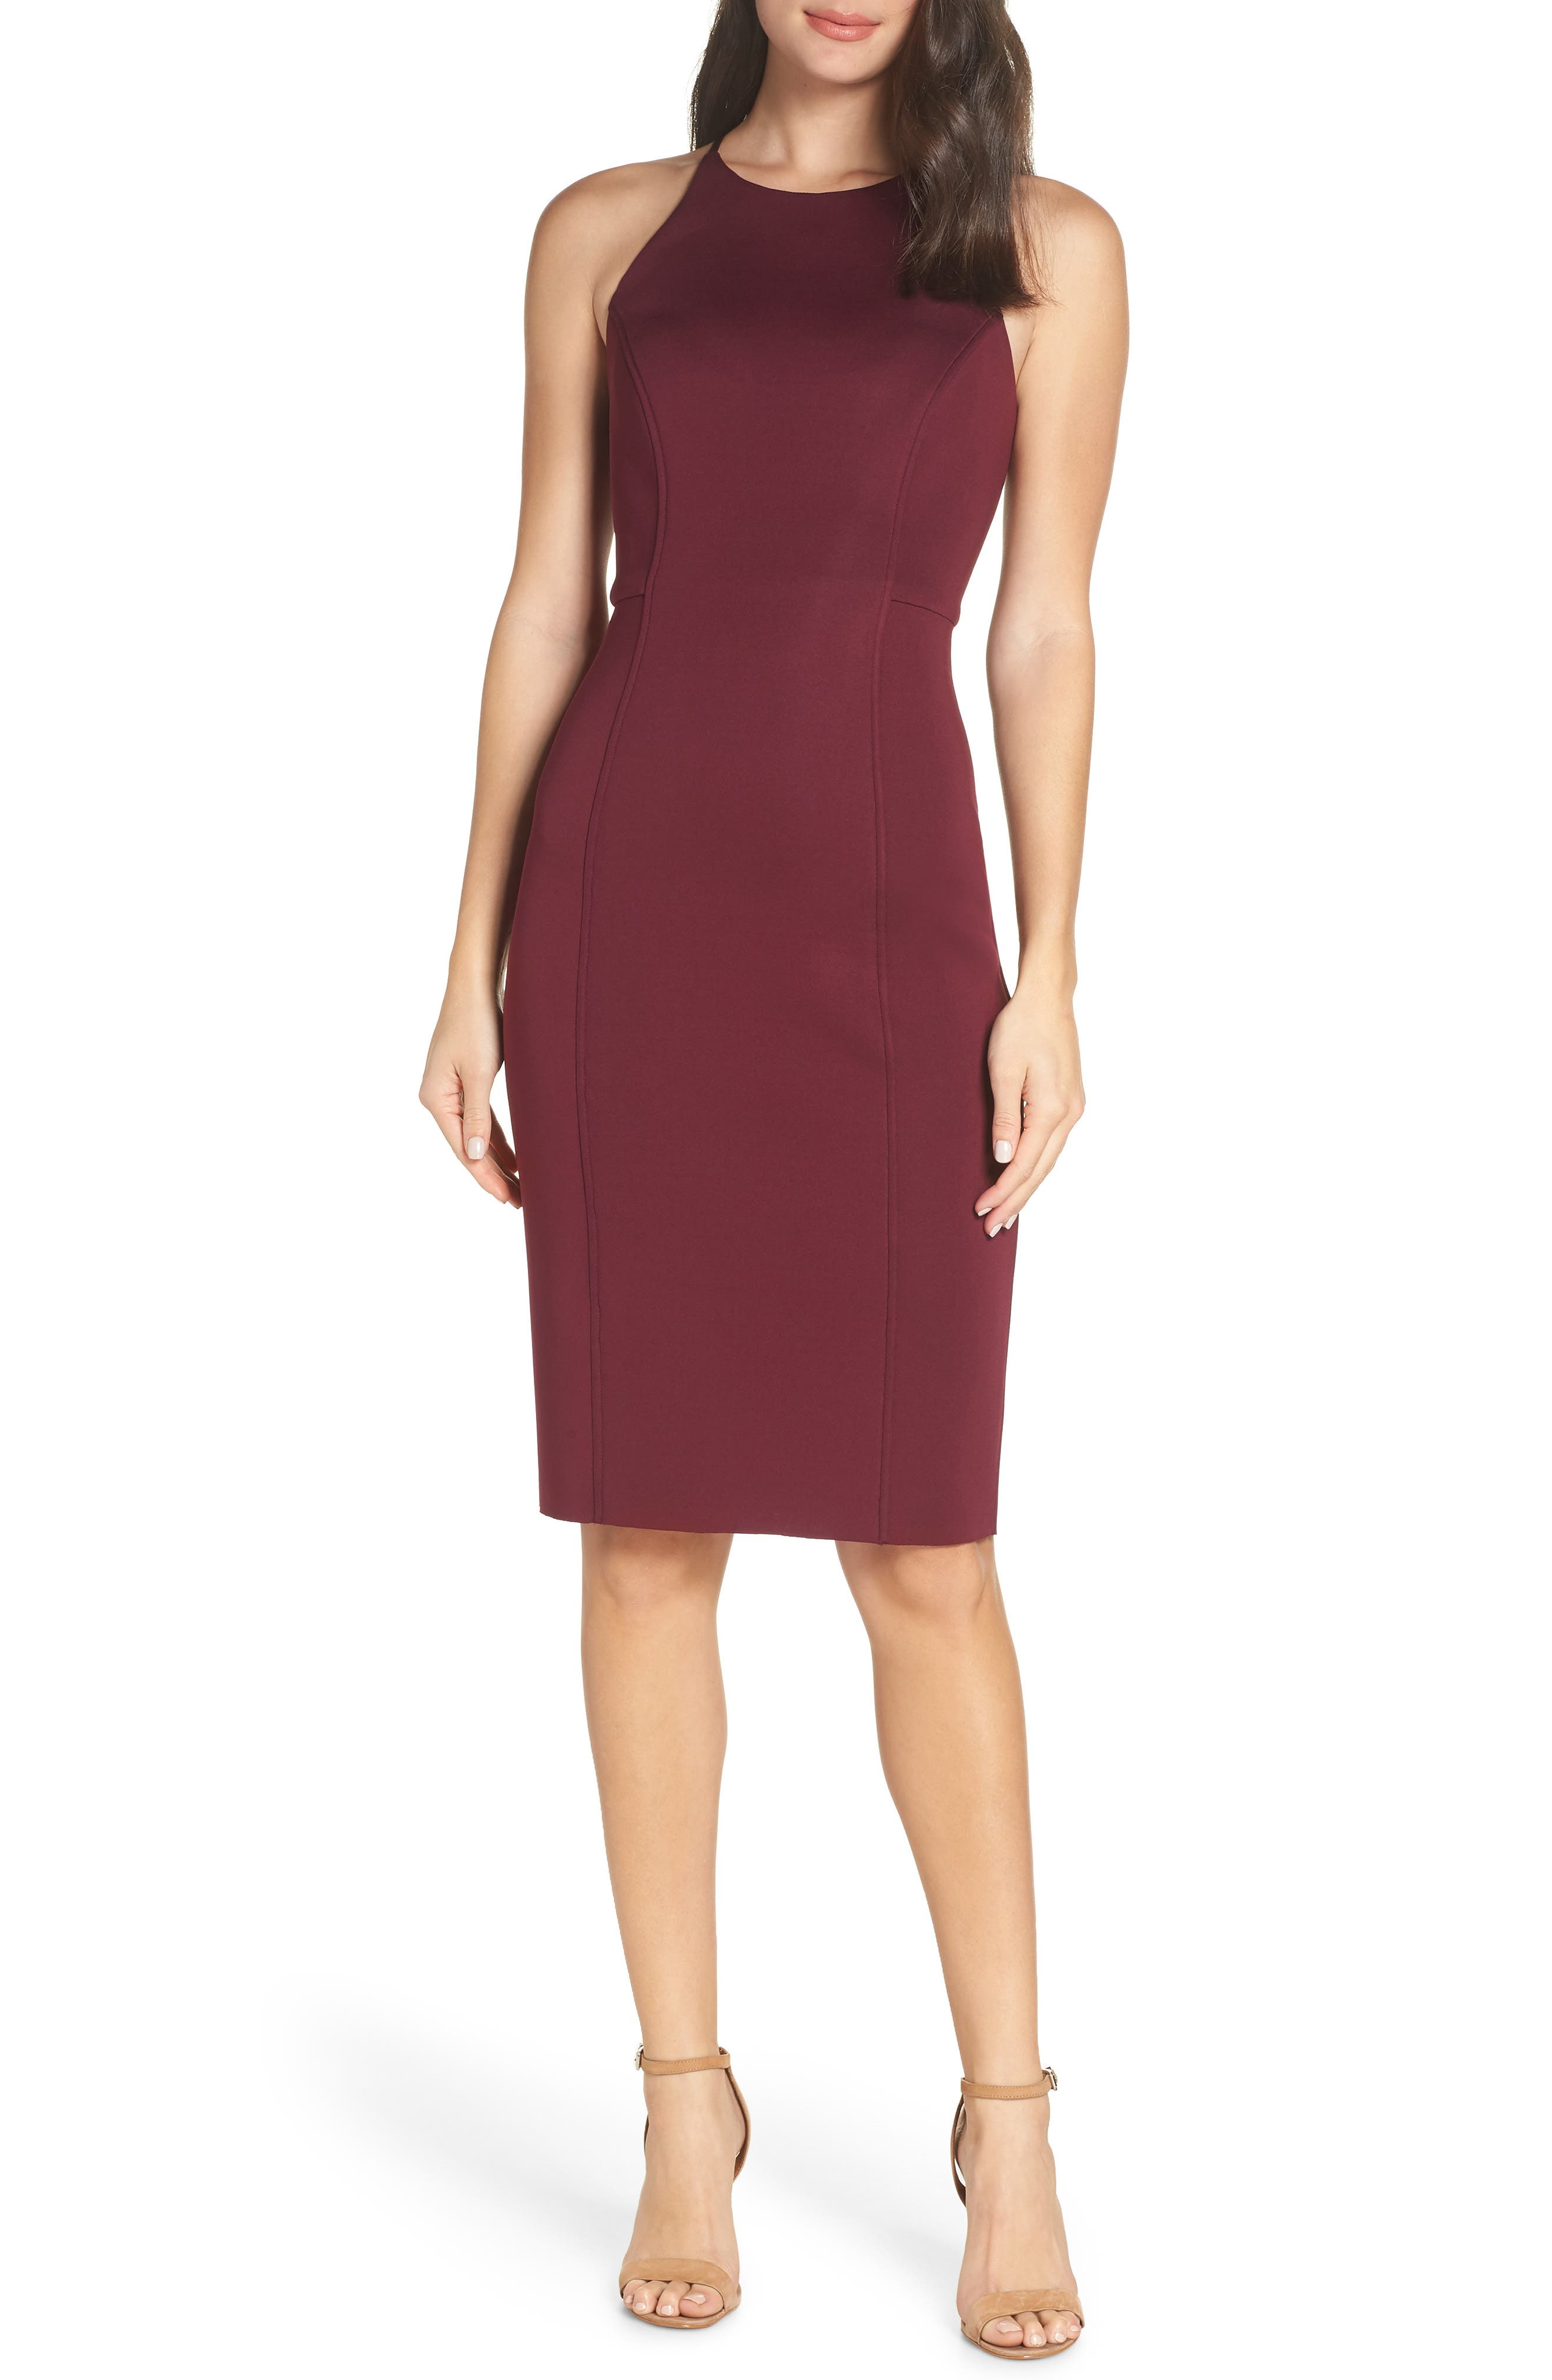 CHELSEA28 Scuba Sheath Dress, Main, color, BURGUNDY